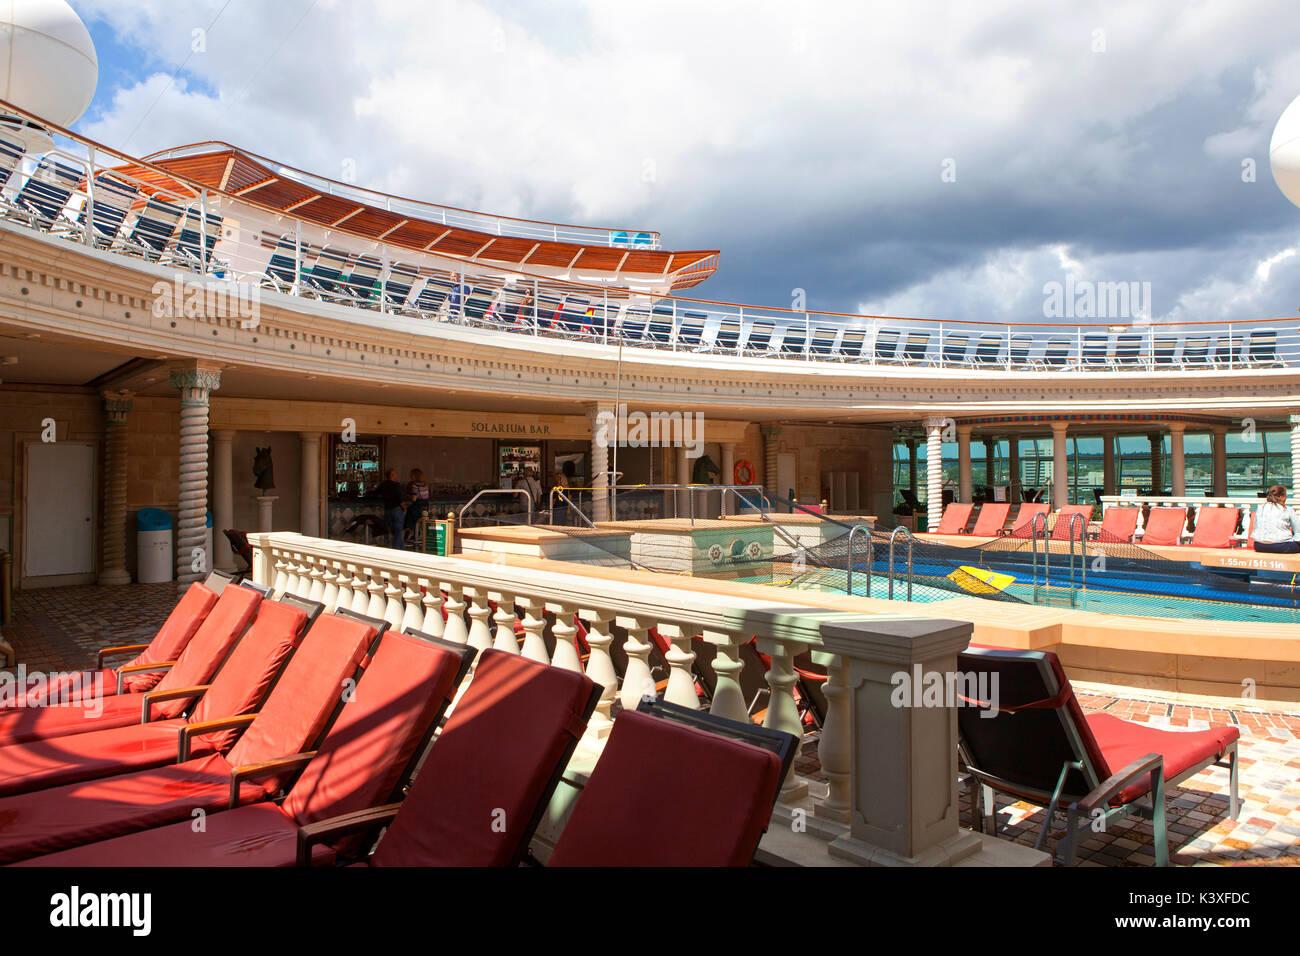 Pool deck 11 of Royal Caribbean Navigator of the Seas cruise ship Stock Photo